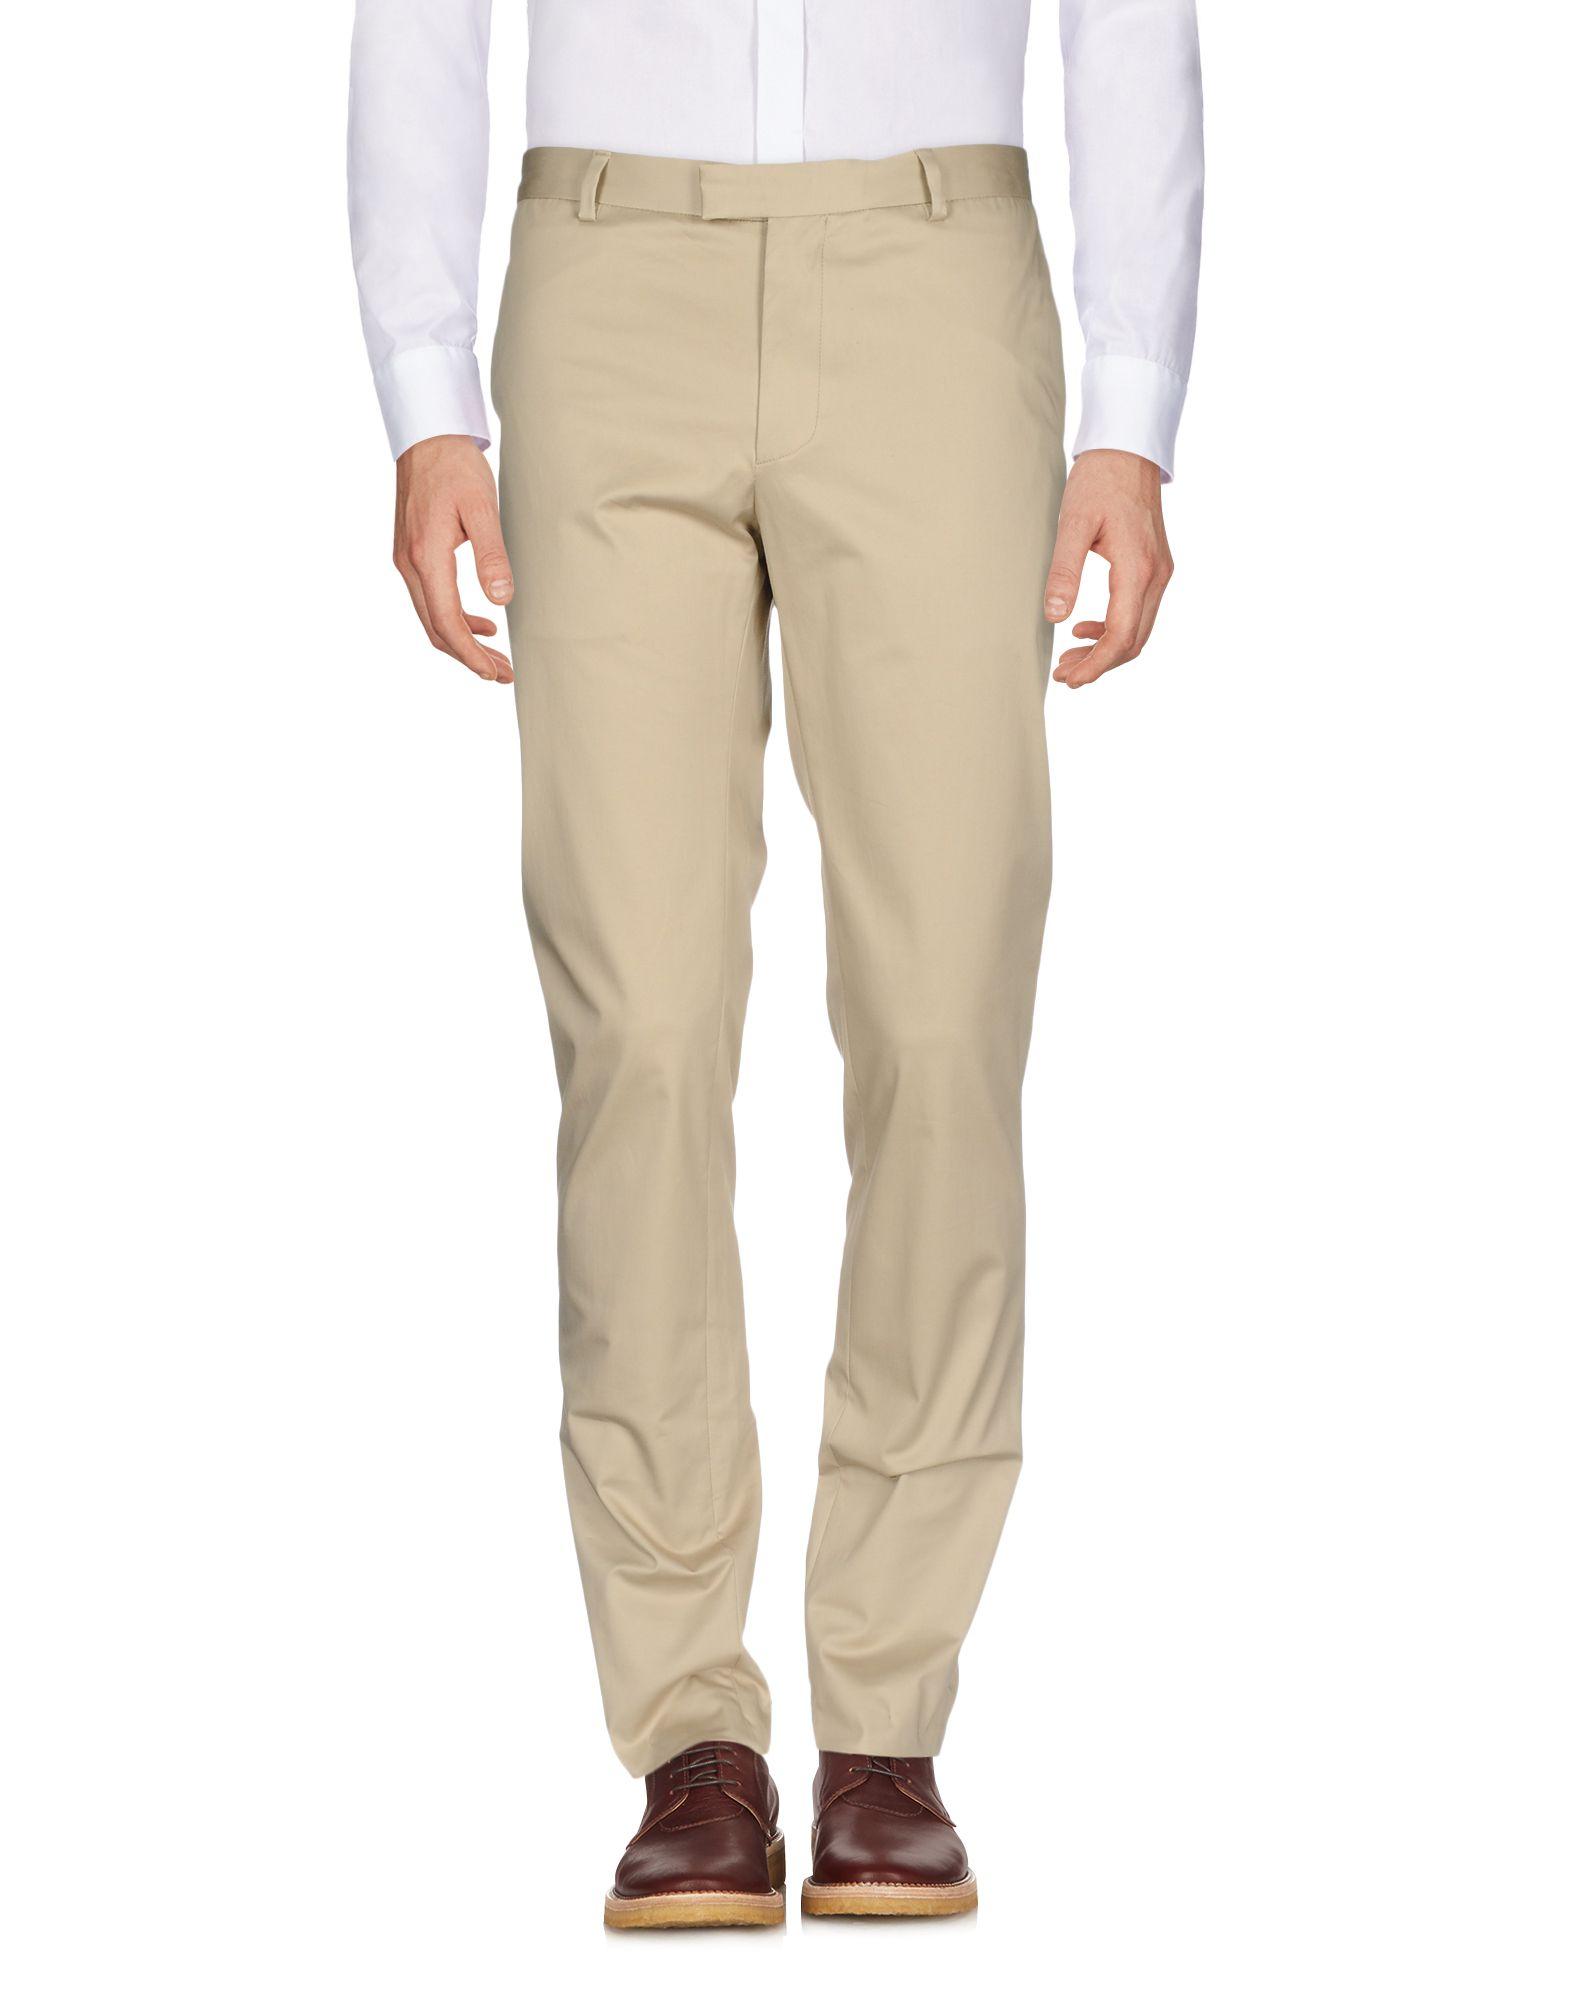 Pantalone Strelli.Homme Donna - Acquista online su